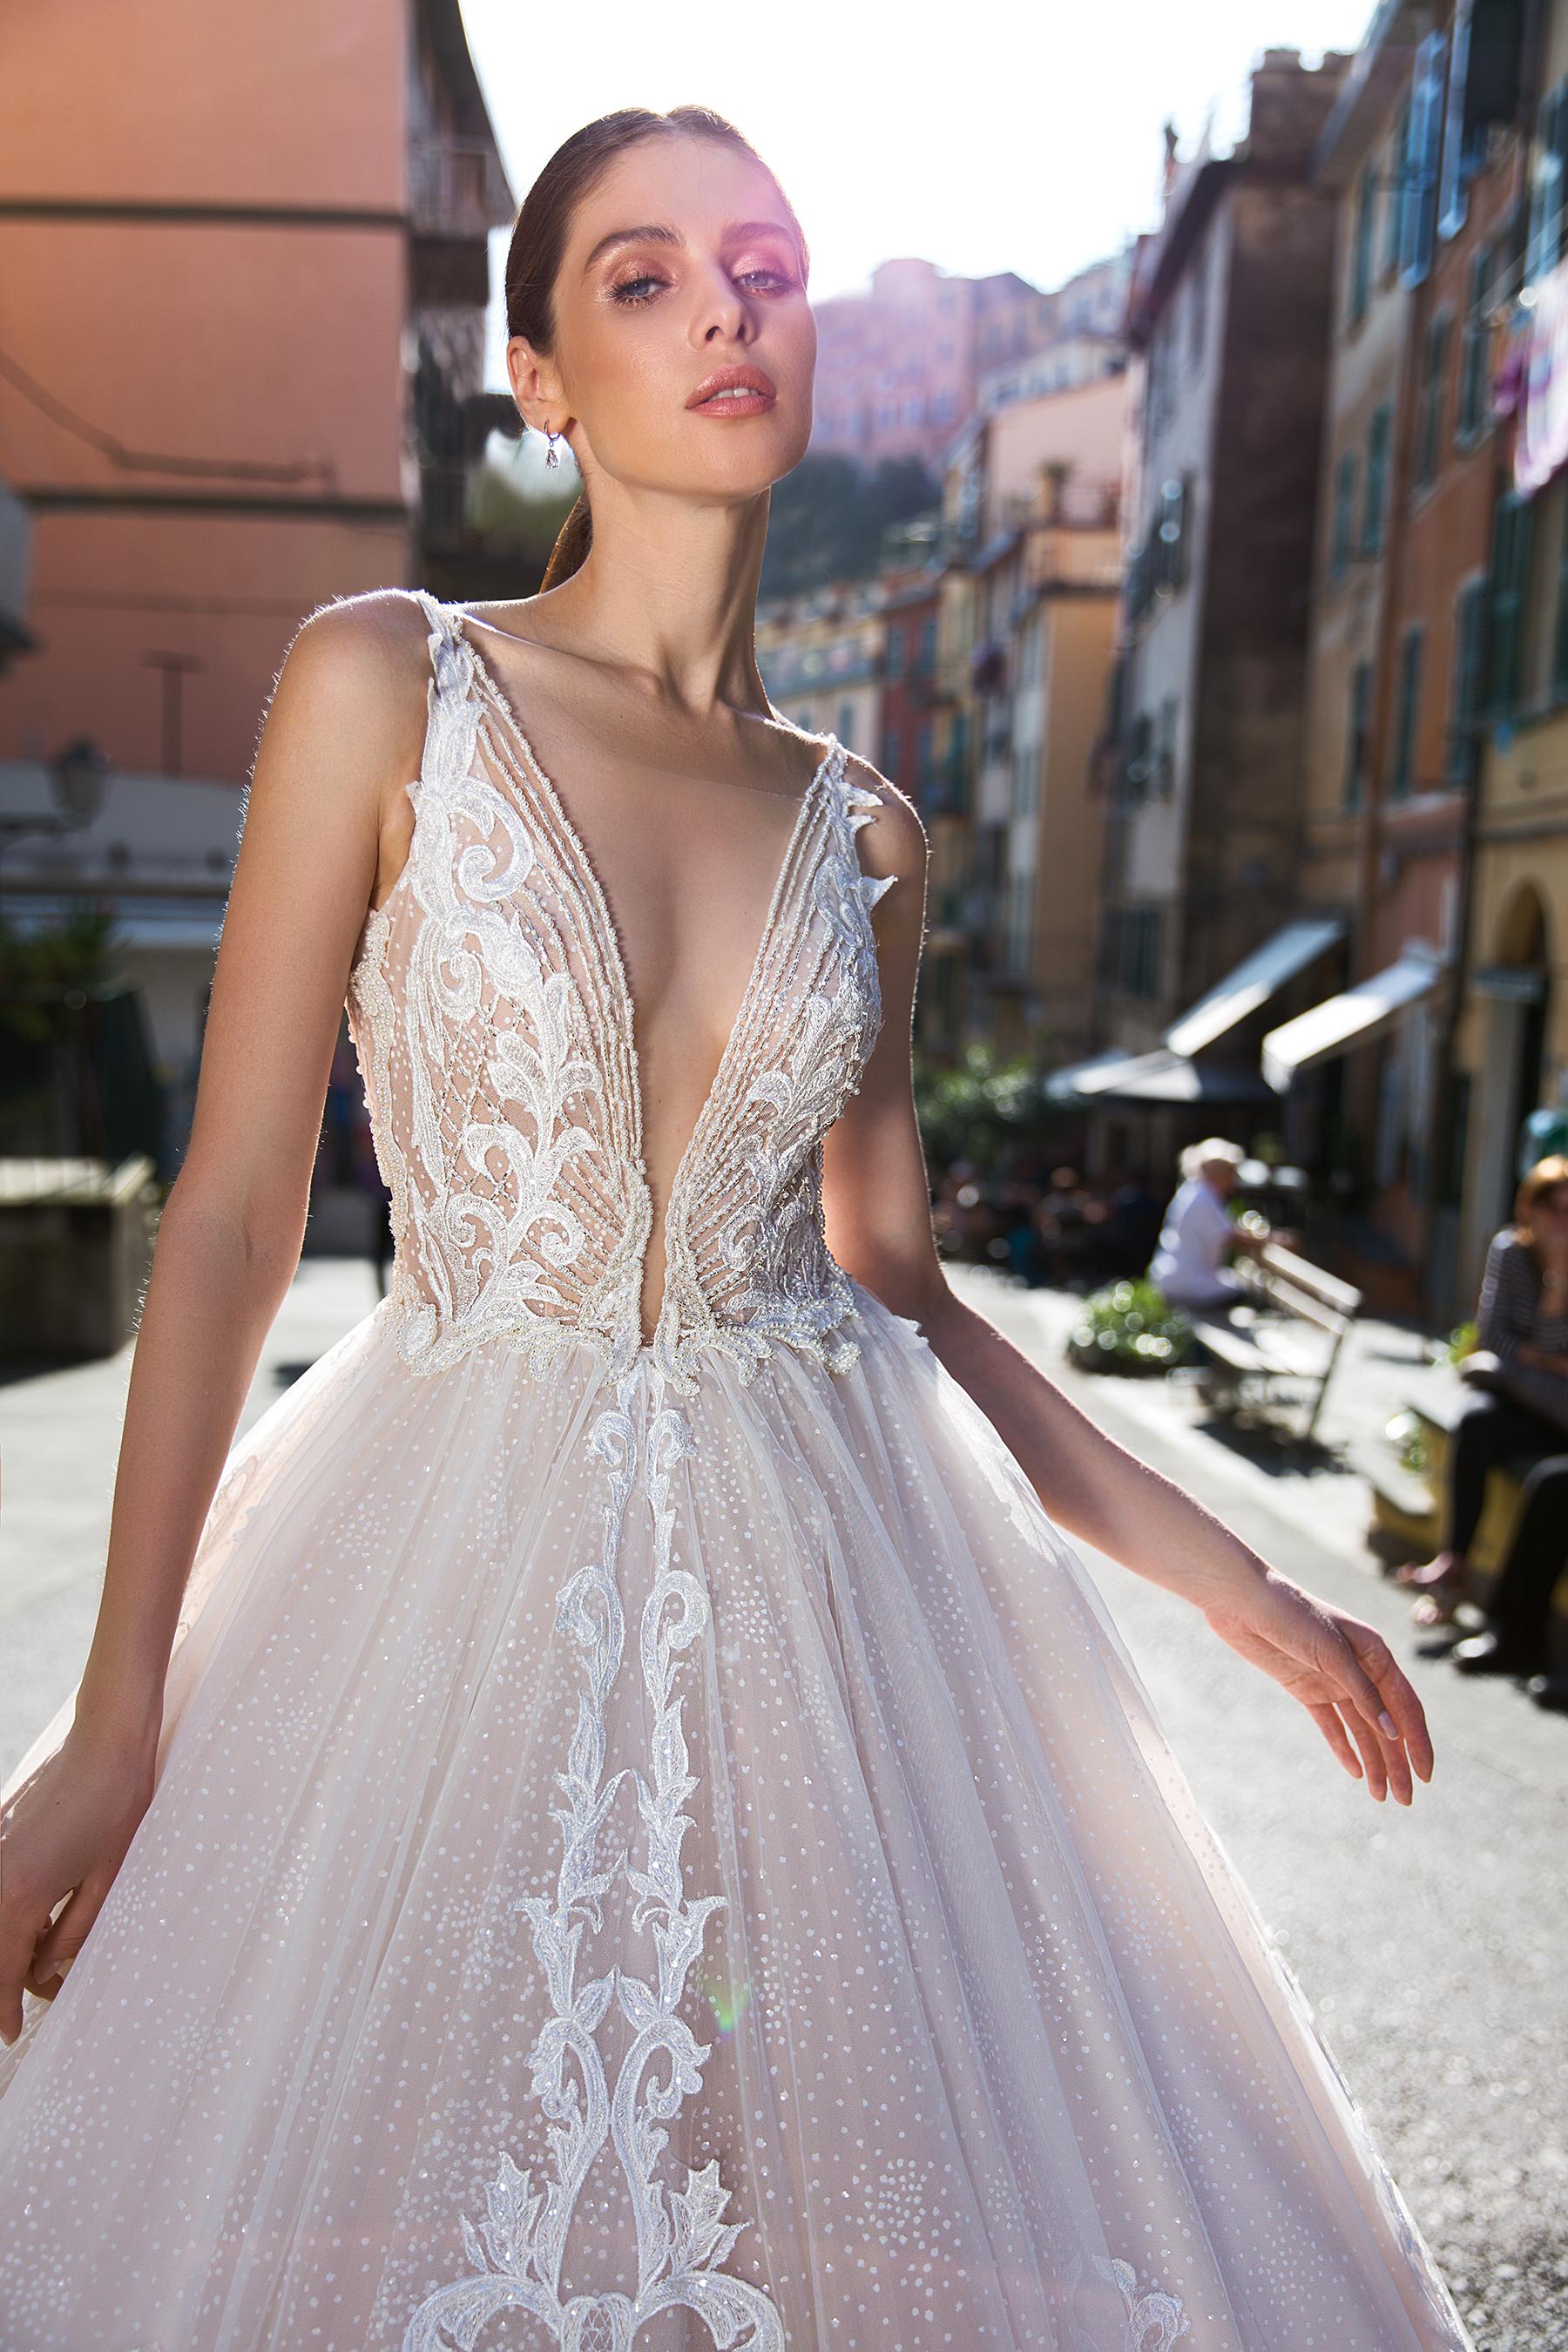 site autorizat mai ieftin online aici Rochie de mireasa printesa Lychianna - Sposa Dell Amore: Rochii de ...